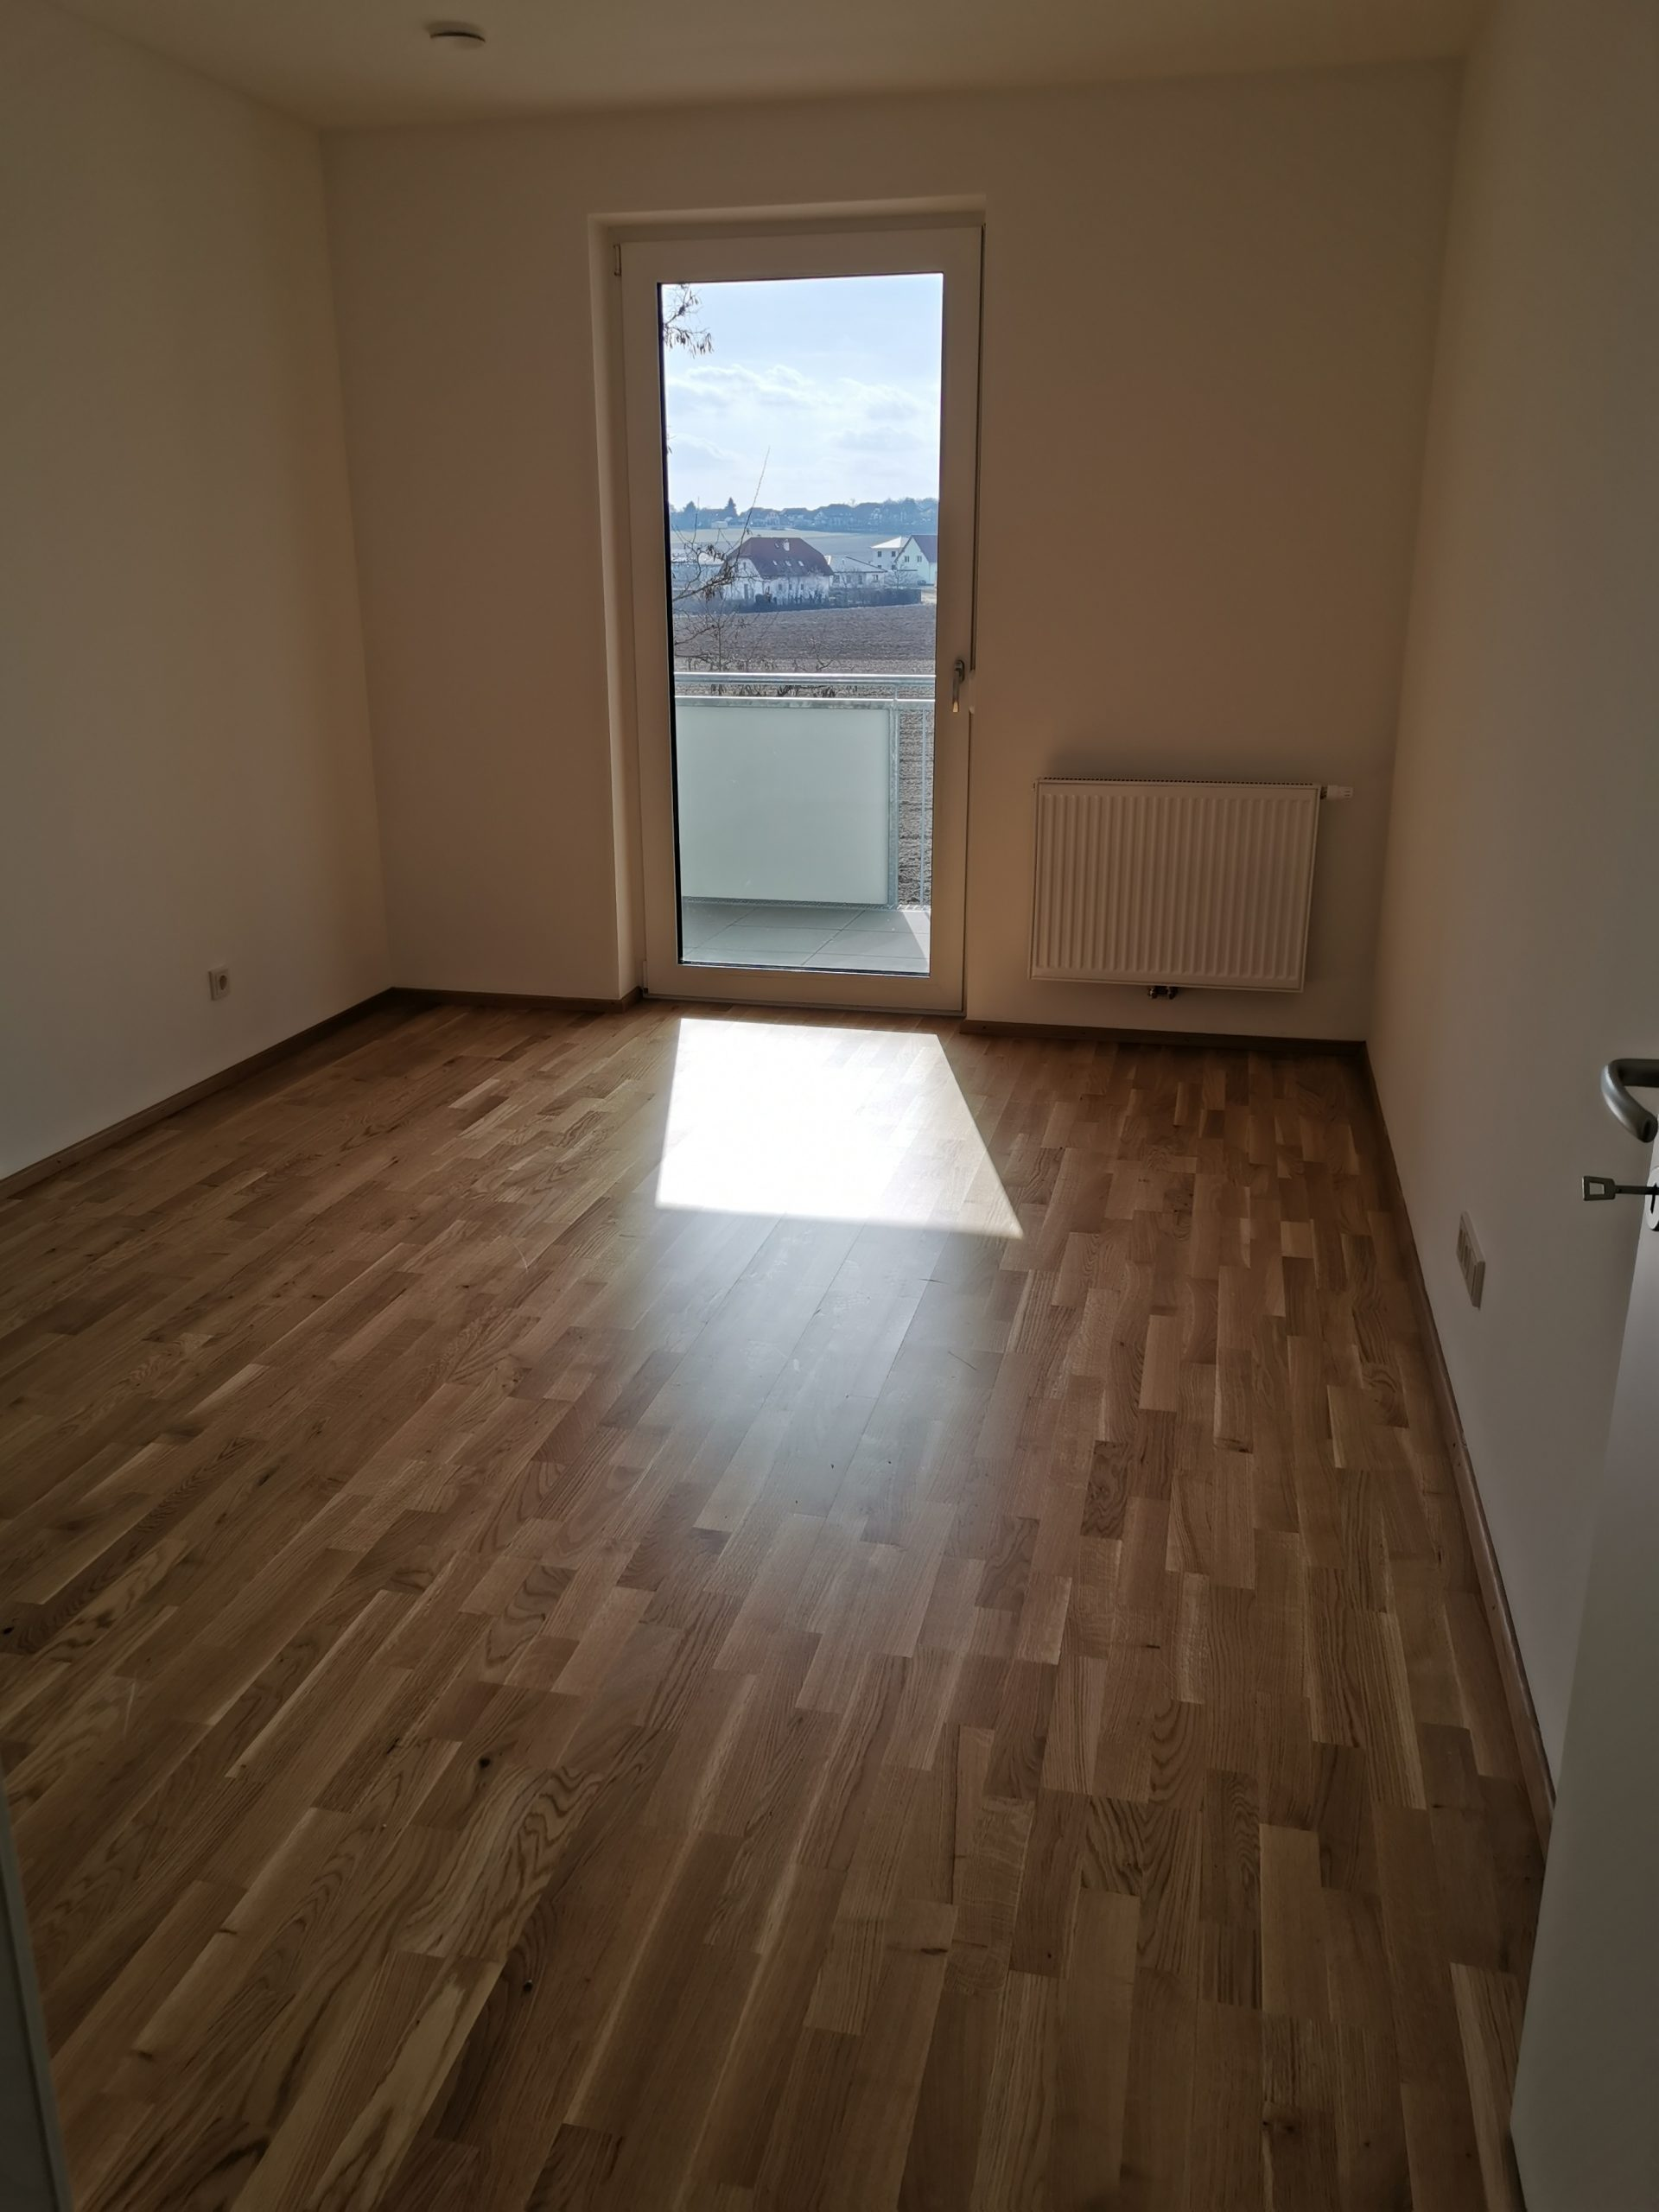 Immobilie von Kamptal in 3730 Eggenburg, Horn, Eggenburg VII - Top 107 #5